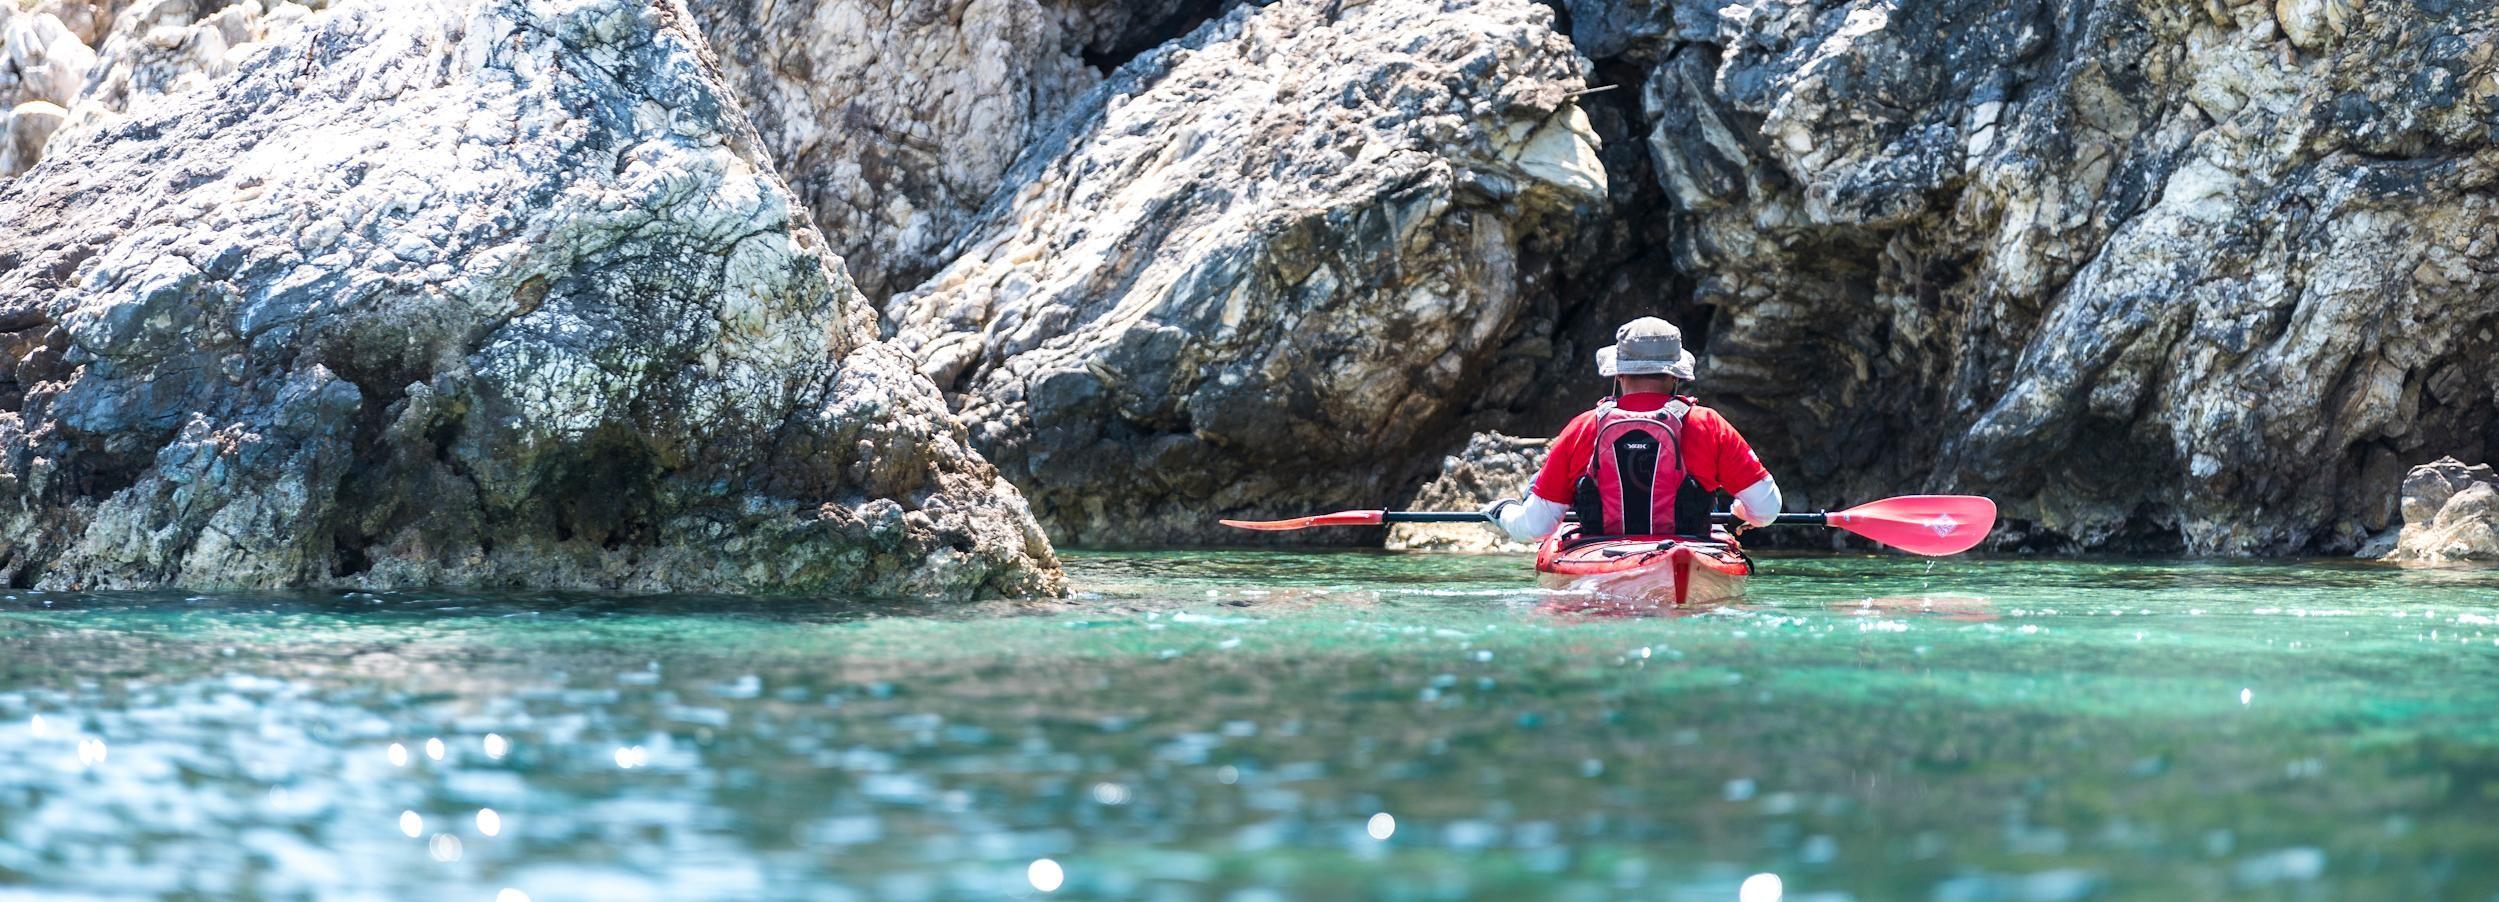 Lefkada: Sea Kayak Experience in the Rouda Bay Sea Caves